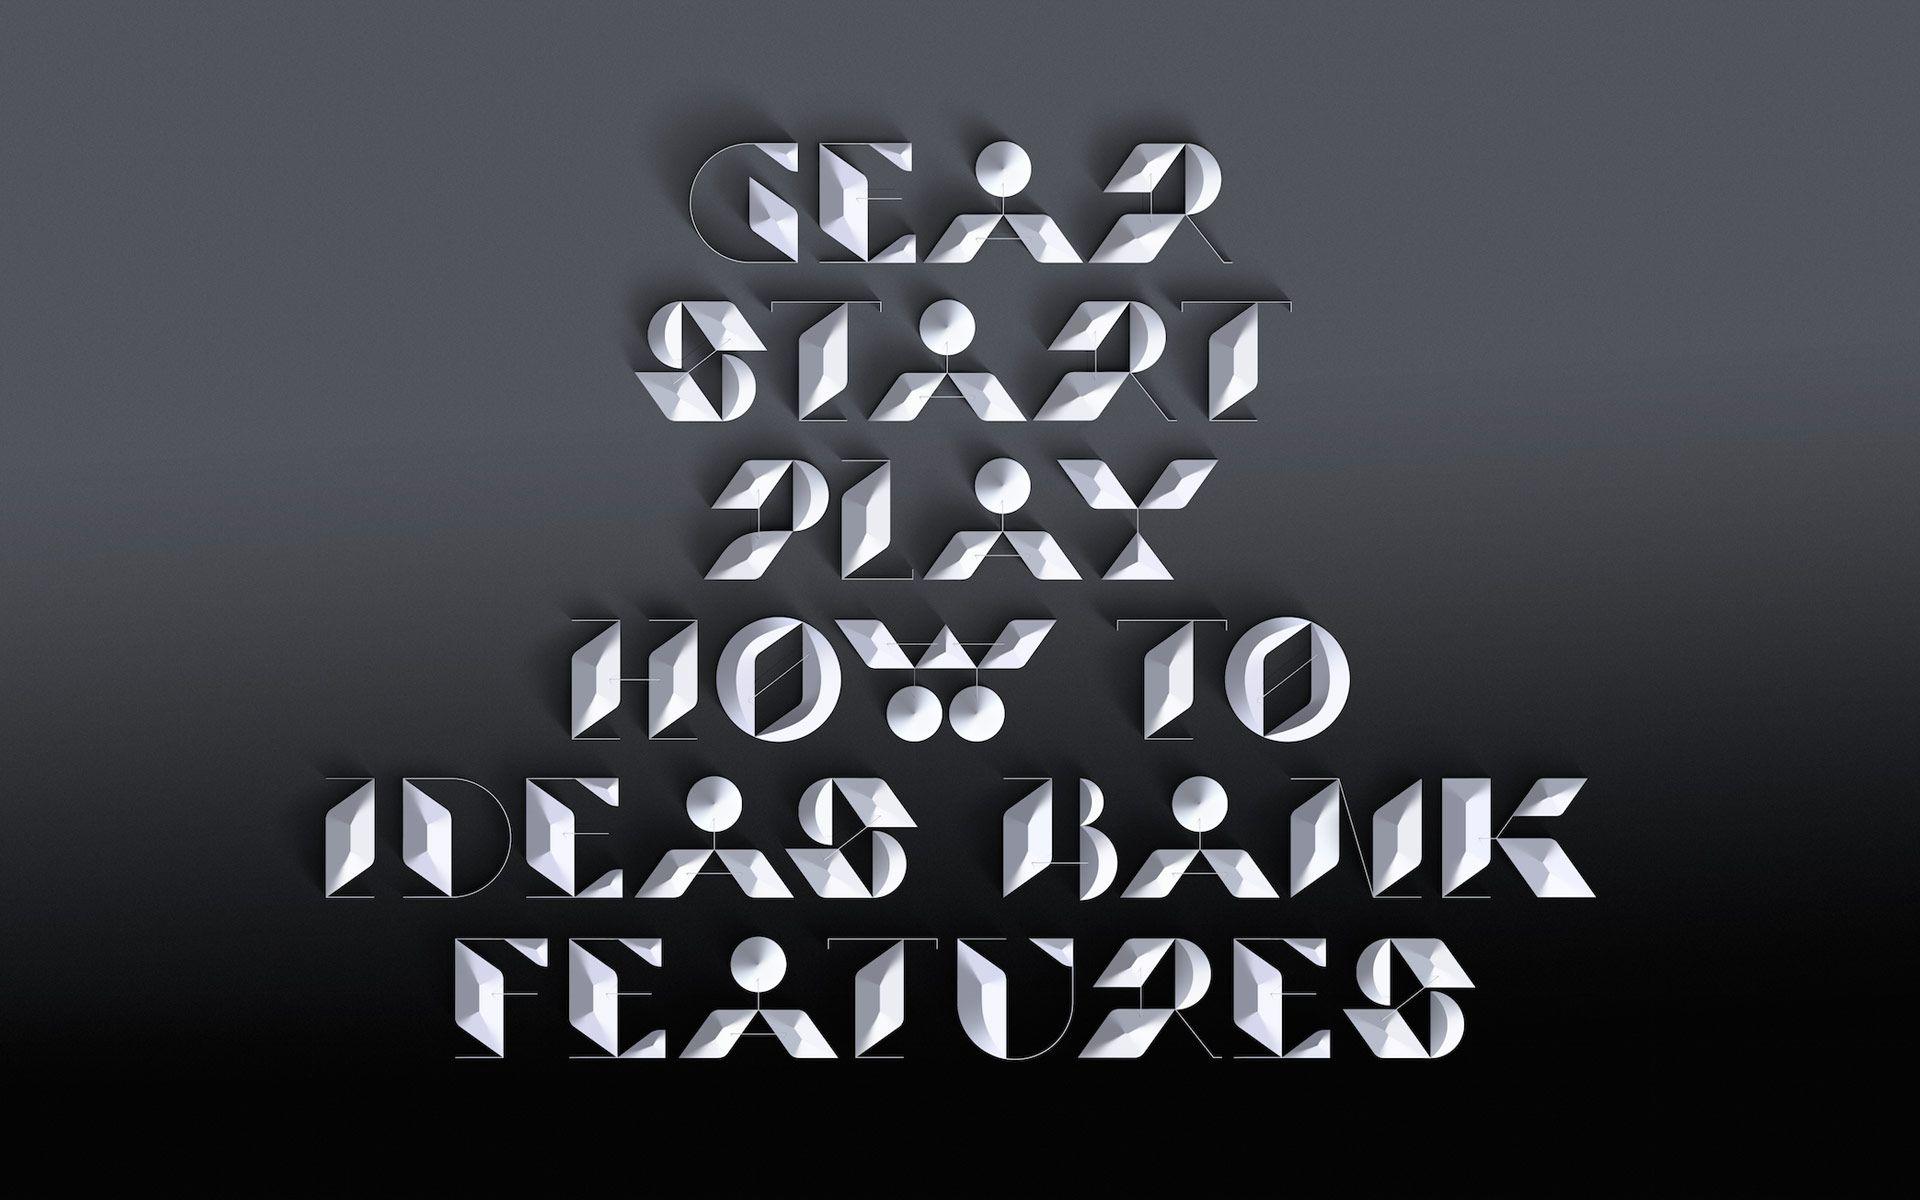 Designer: Rob Gonzalez and Jonathan Quainton of Sawdust